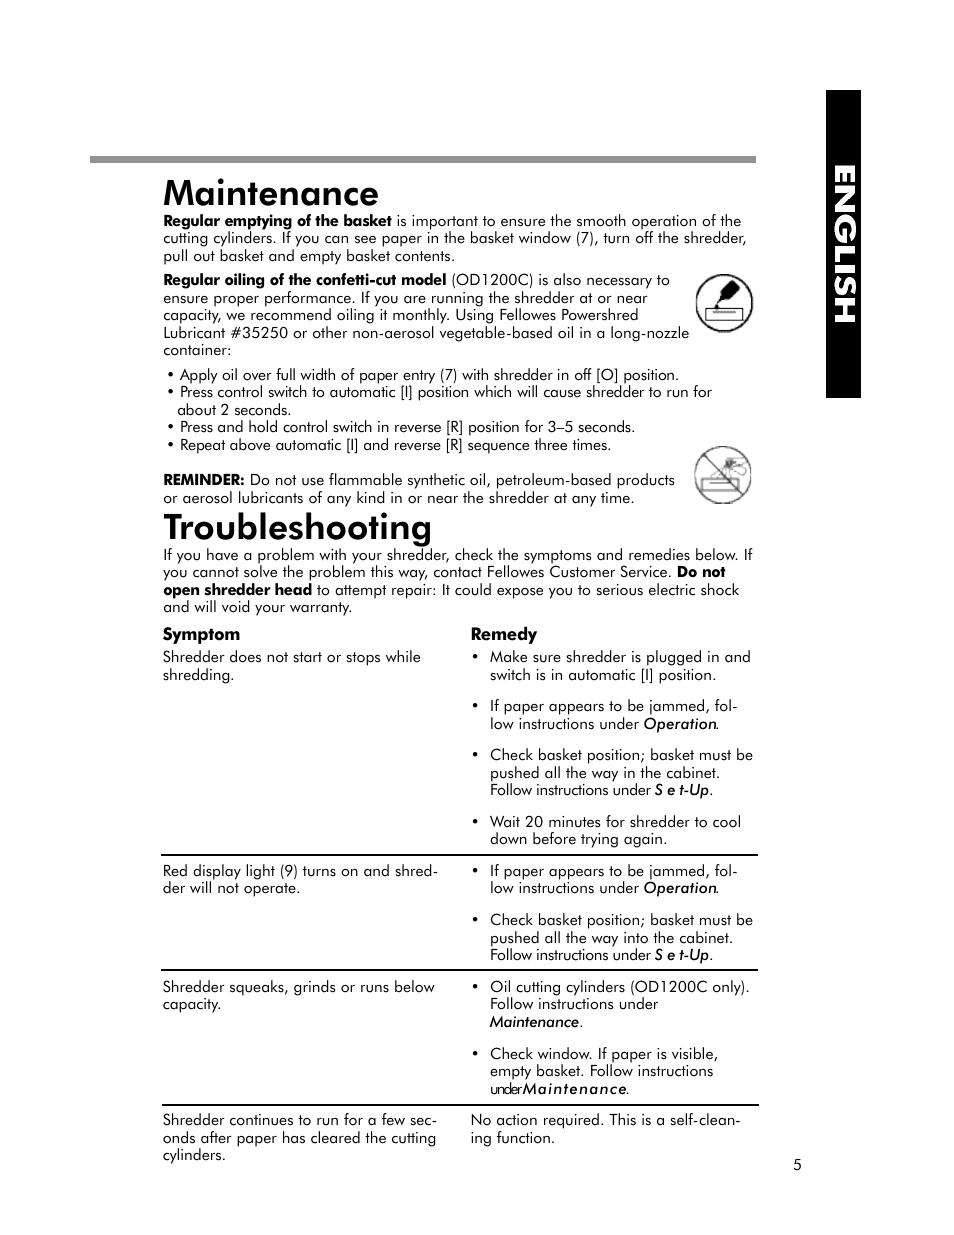 maintenance troubleshooting fellowes od1200 user manual page 6 rh manualsdir com fellowes instruction manual fellowes pb2450 user manual